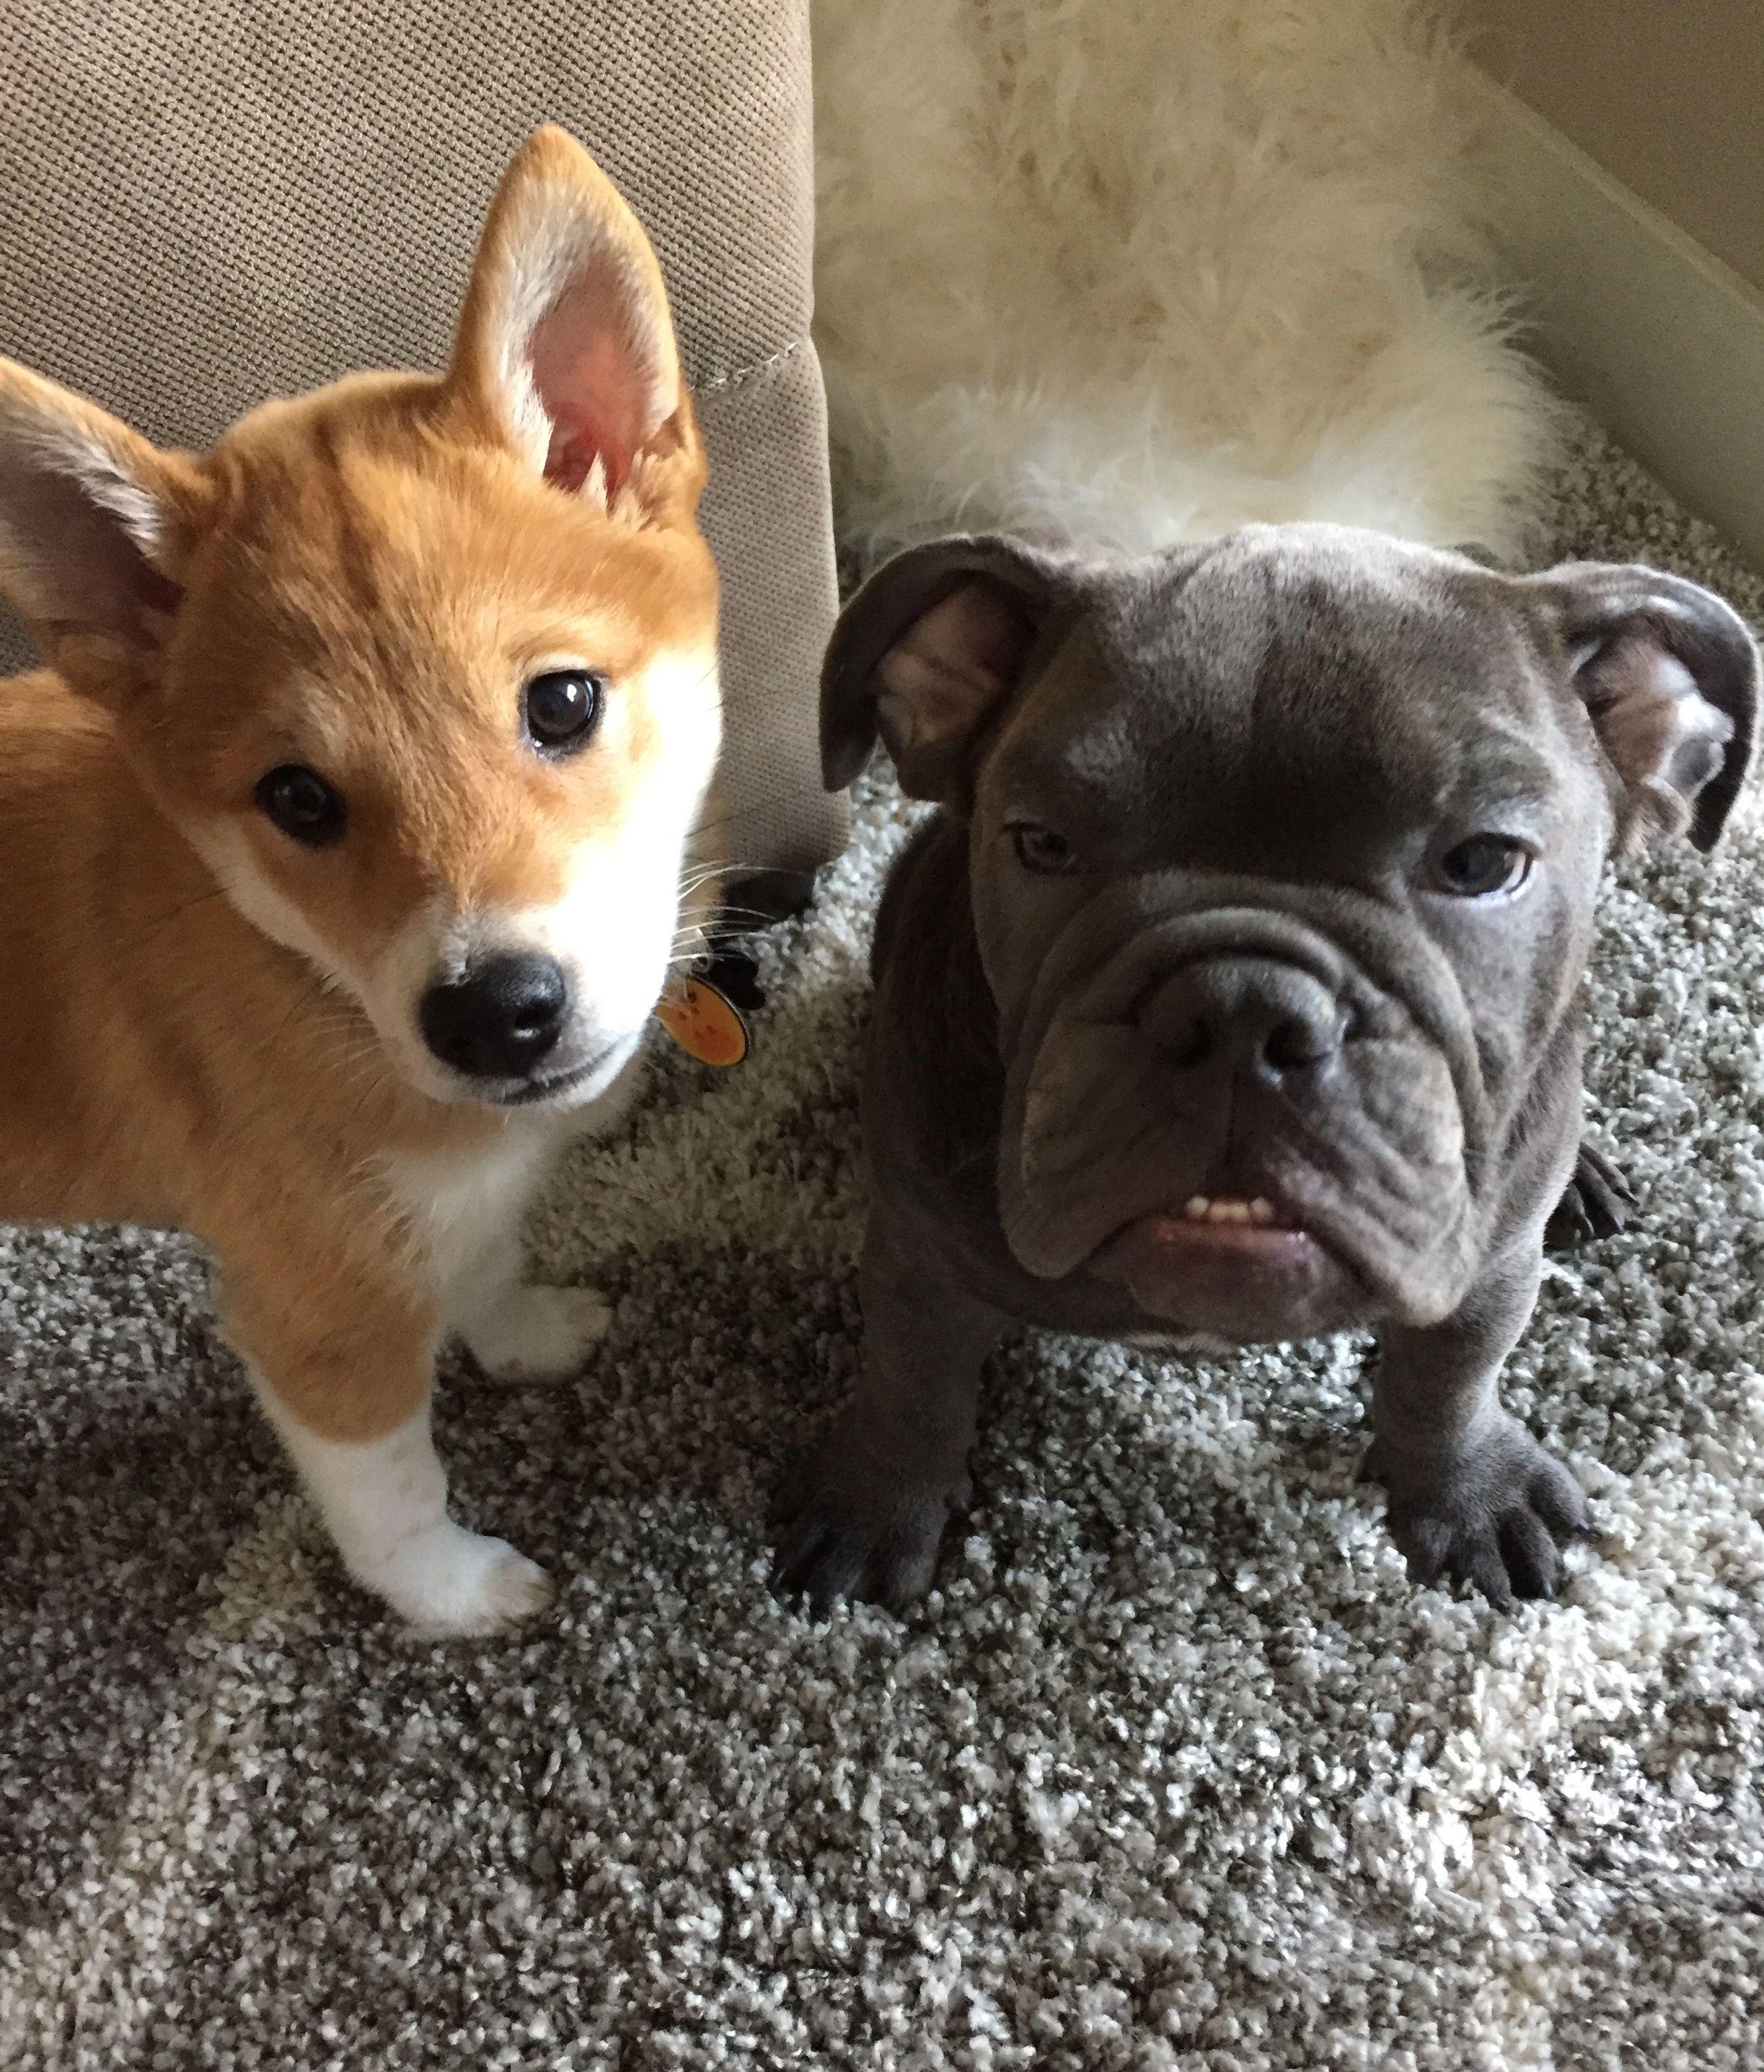 The cutest puppies ever Shiba Inu pup and blue English Bulldog